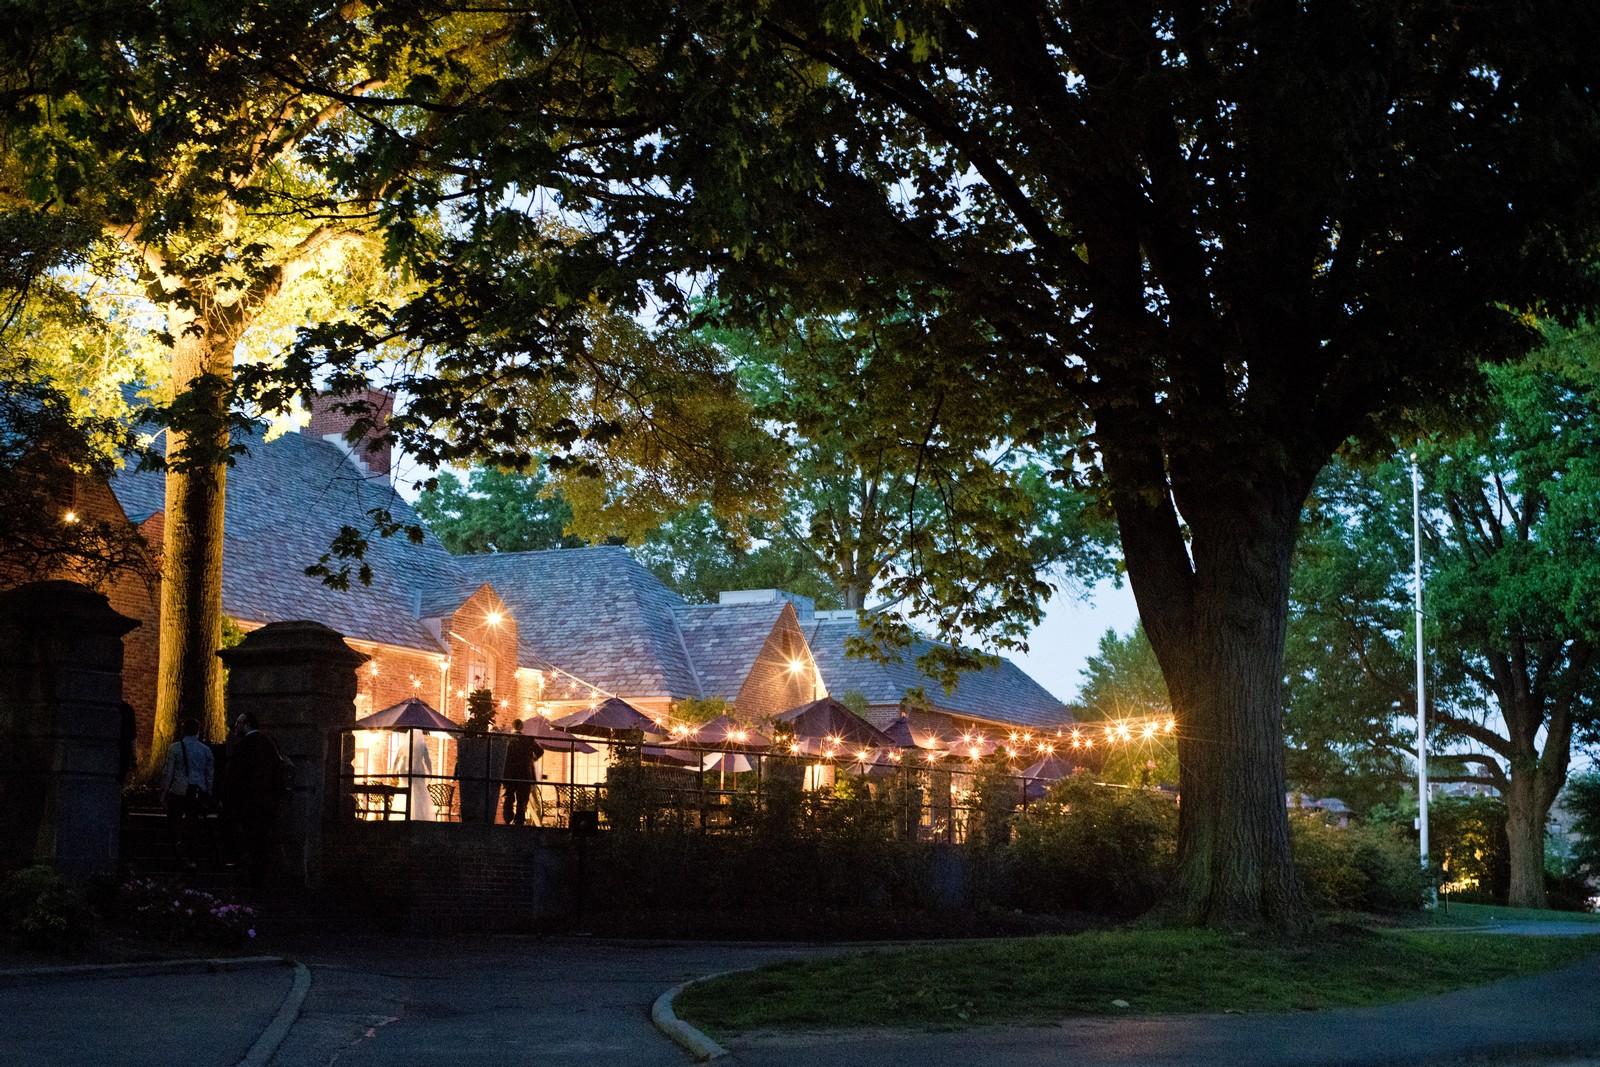 Orthodox Jewish Wedding, Dyker Beach Park and Golf Course, Brooklyn, New York, Photo by Chaim Schvarcz, Evening Lights, Venue